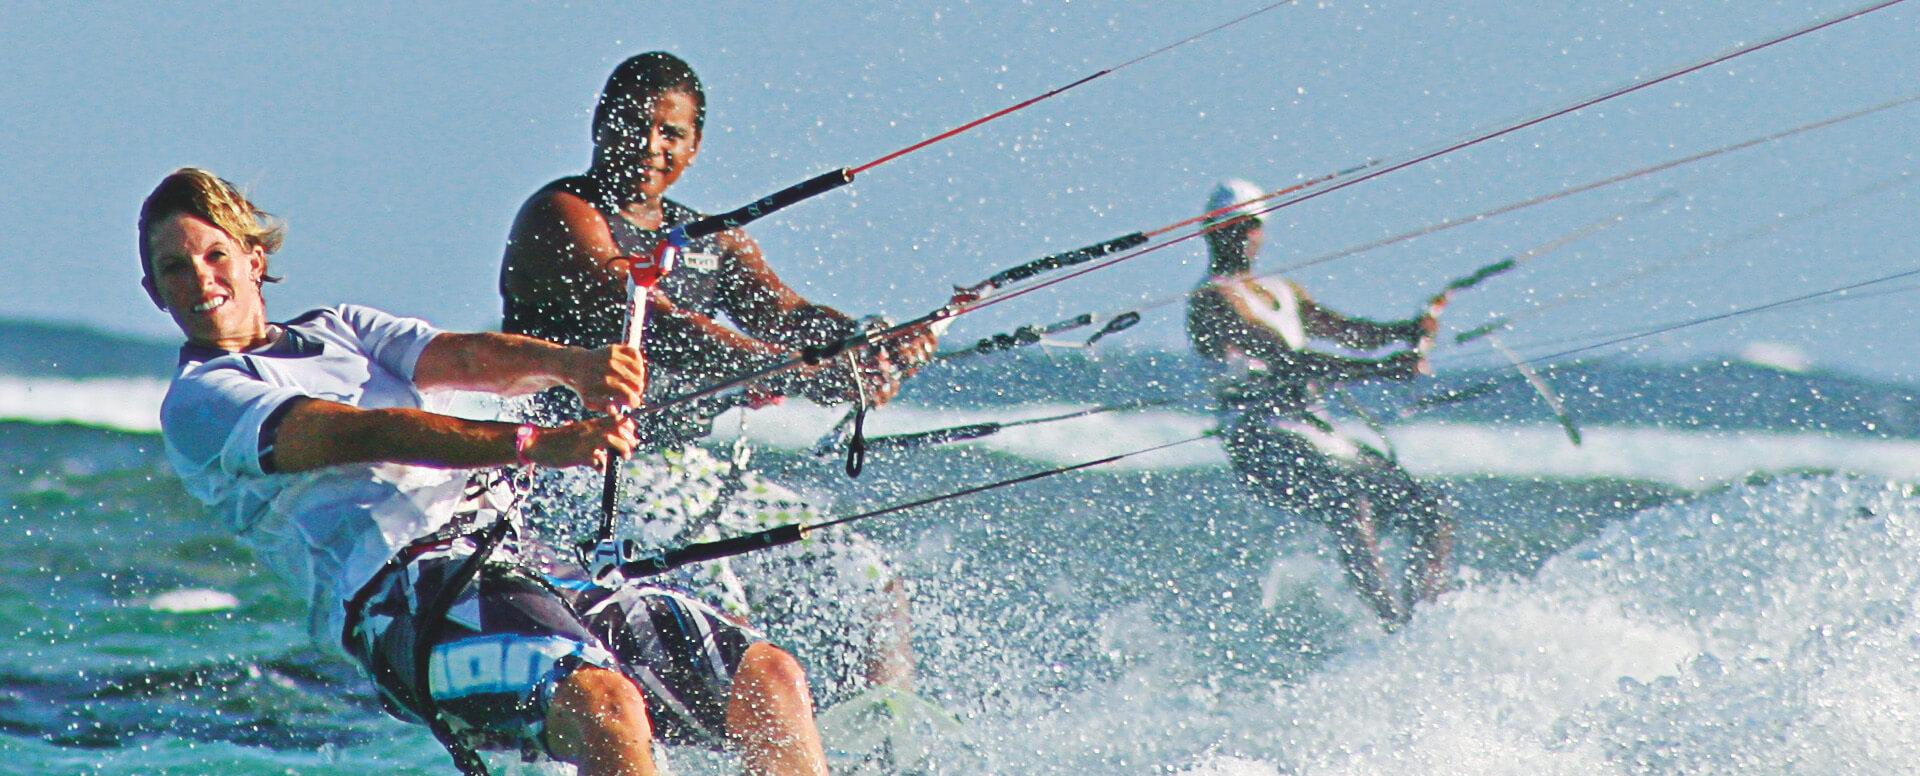 4. Le kitesurf - Île Maurice